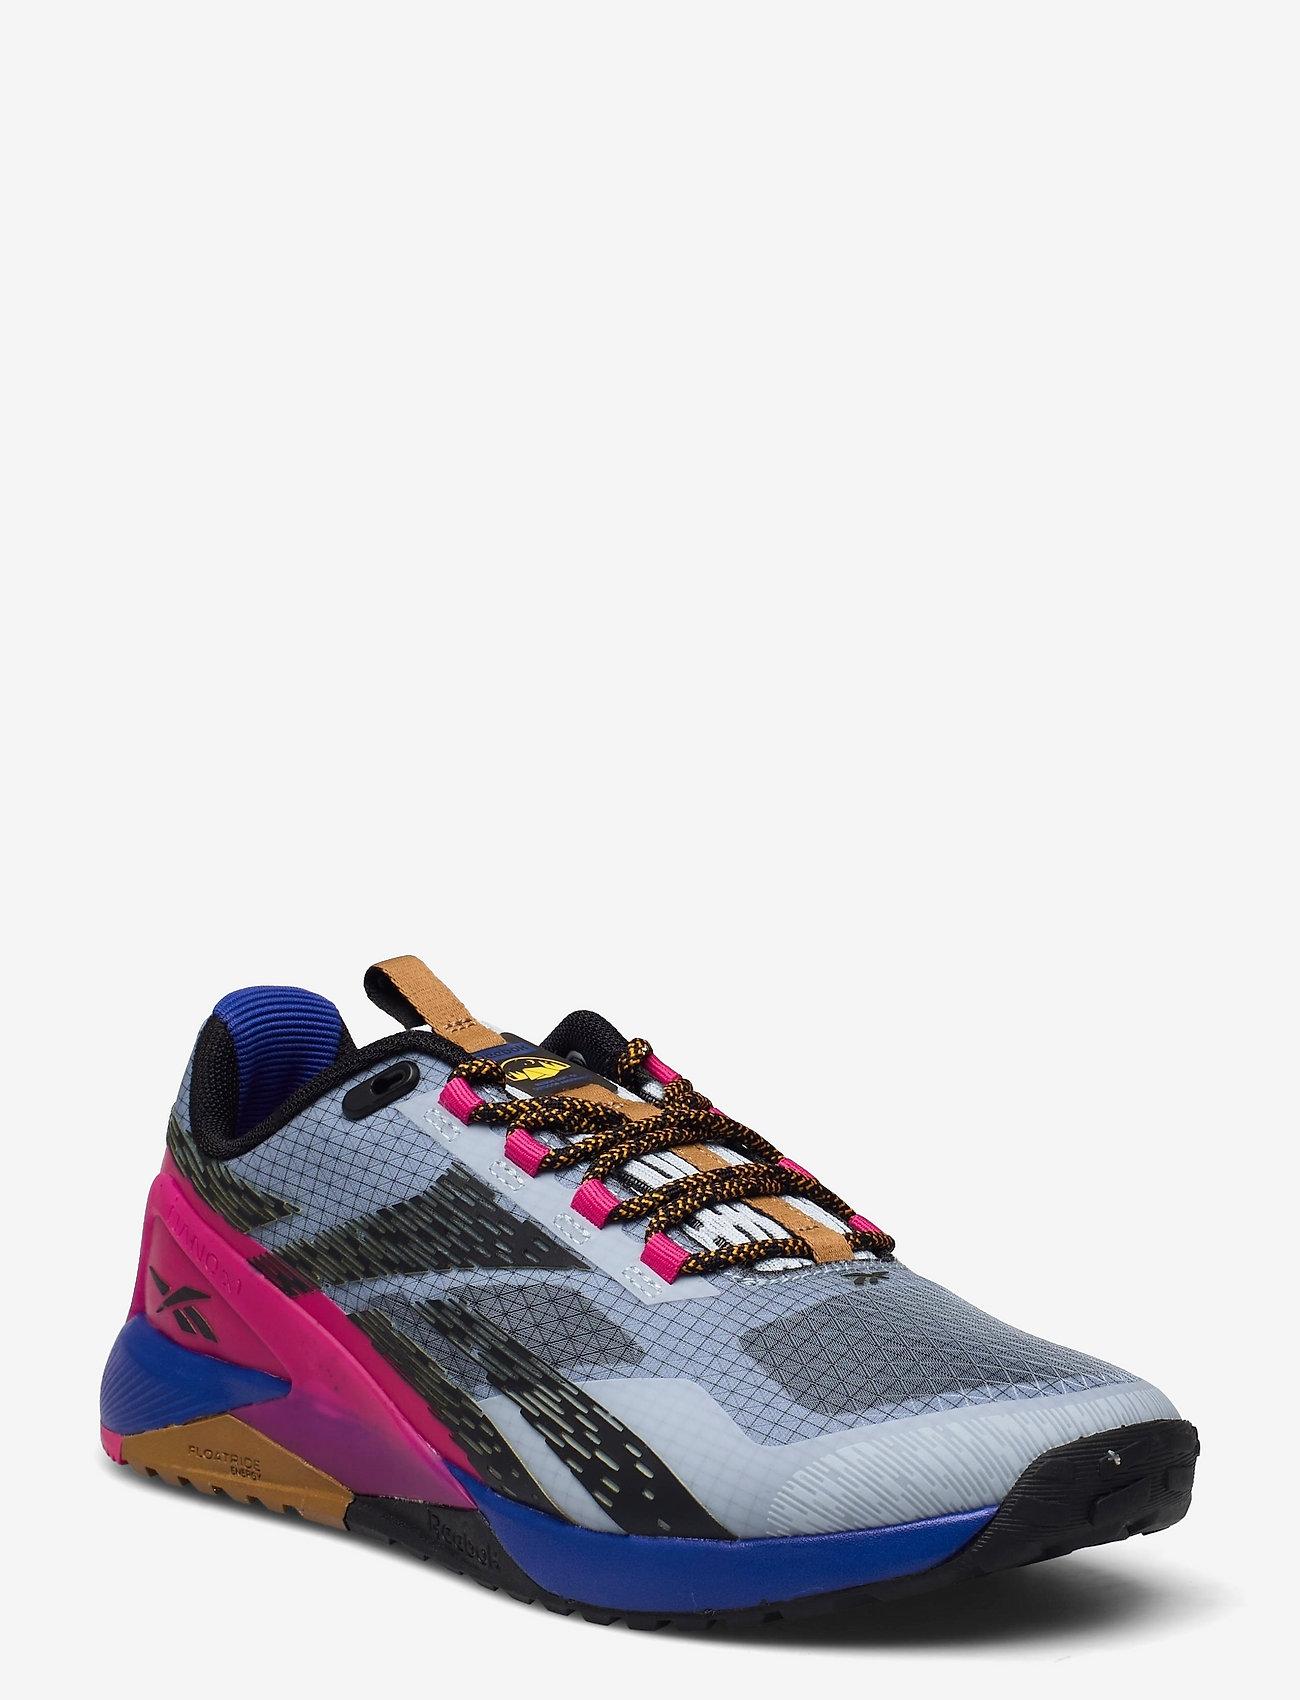 Reebok Performance - NANO X1 TR ADVENTURE - training schoenen - gabgry/brgcob/purpnk - 0